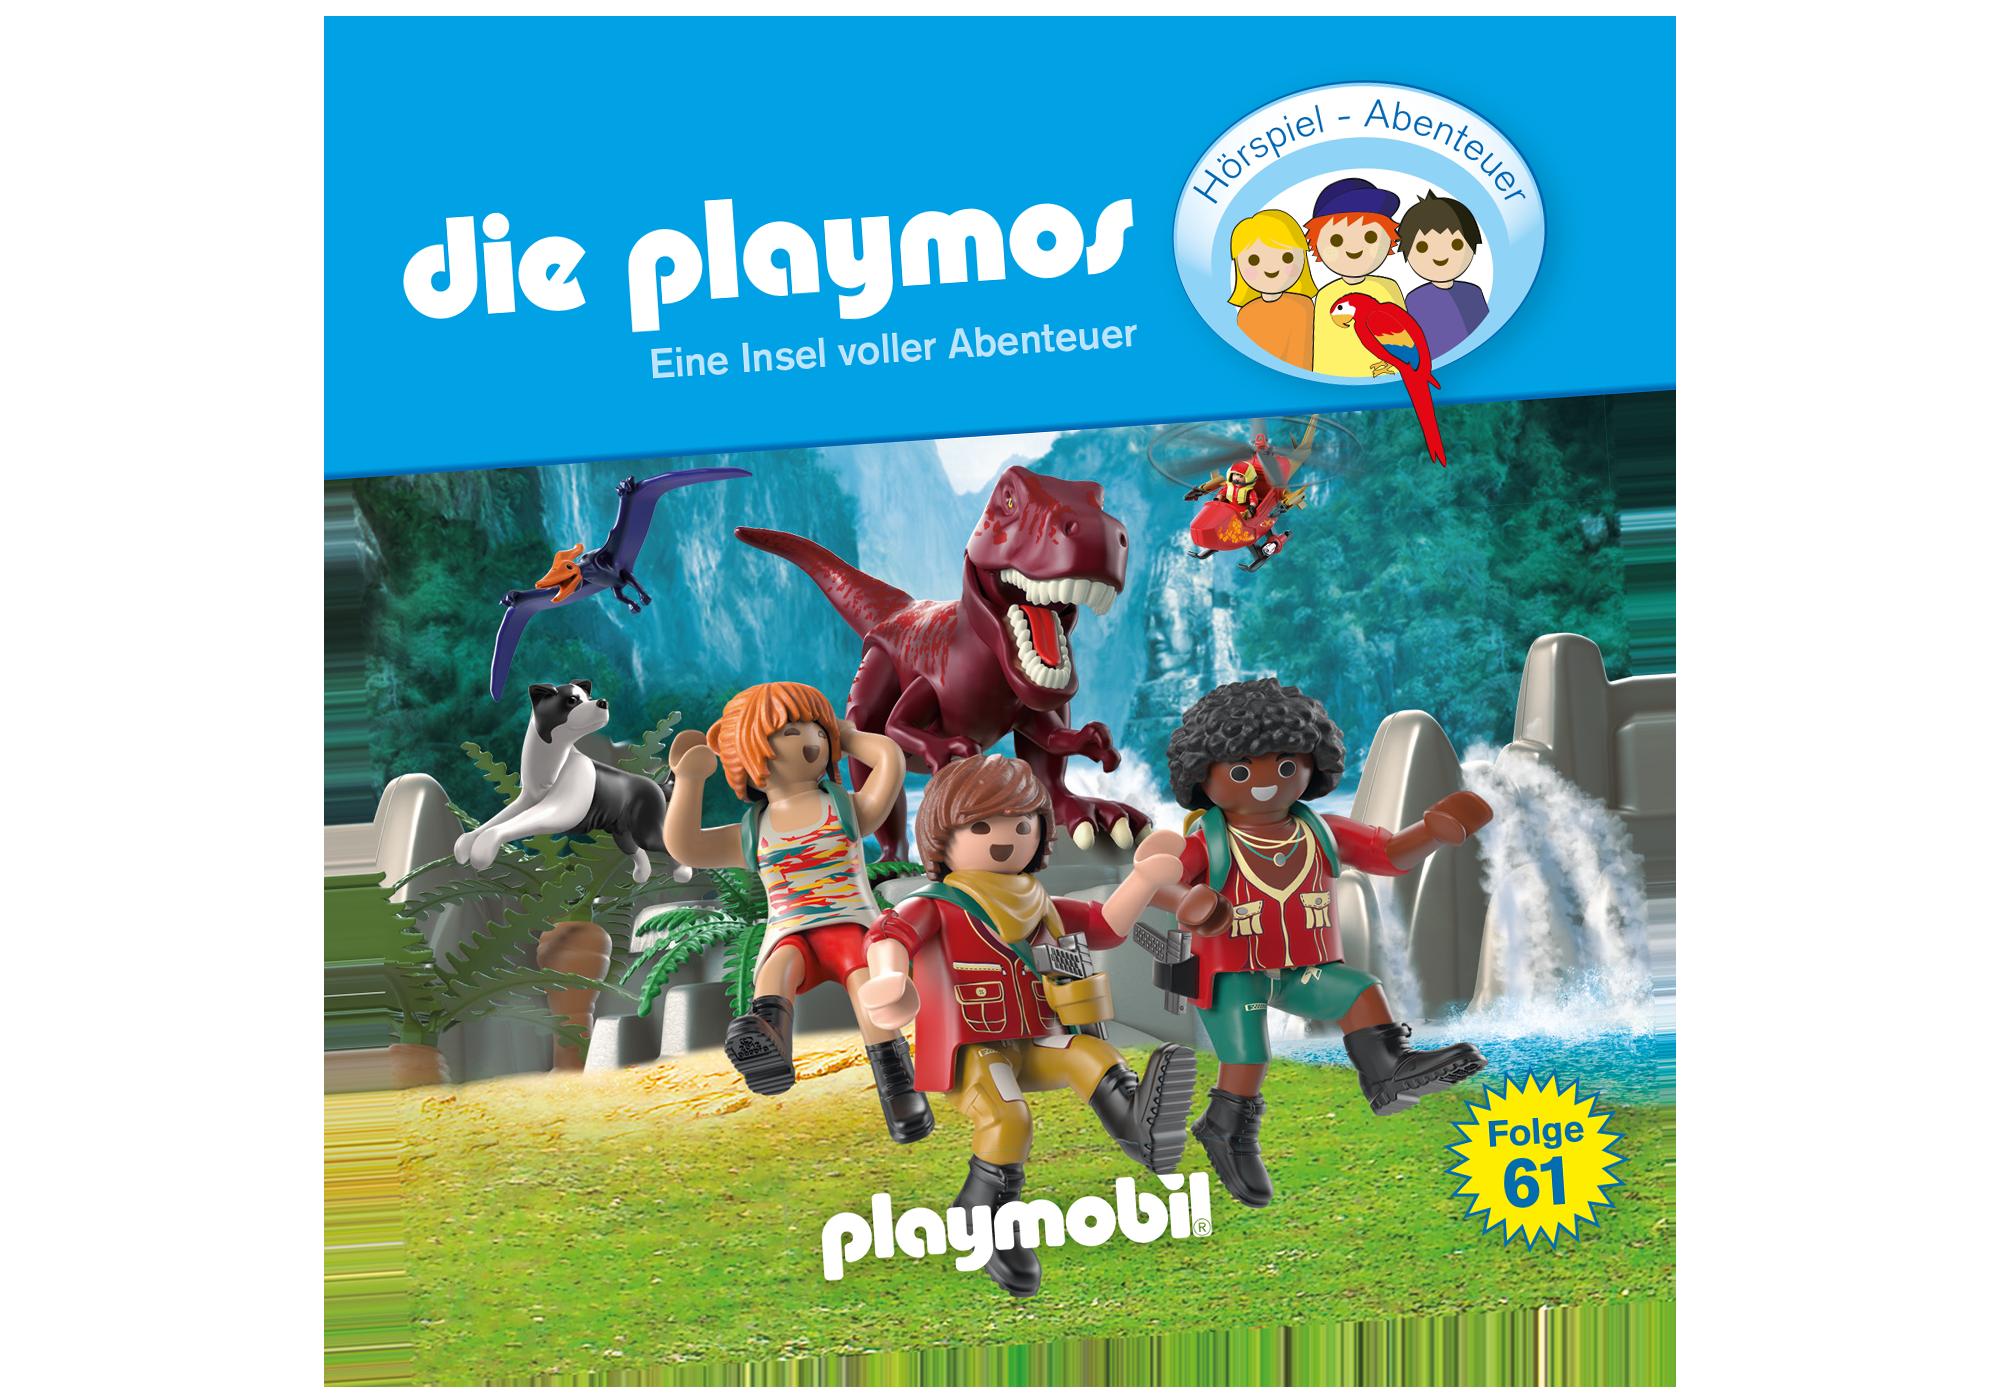 http://media.playmobil.com/i/playmobil/80083_product_detail/Eine Insel voller Abenteuer - Folge 61